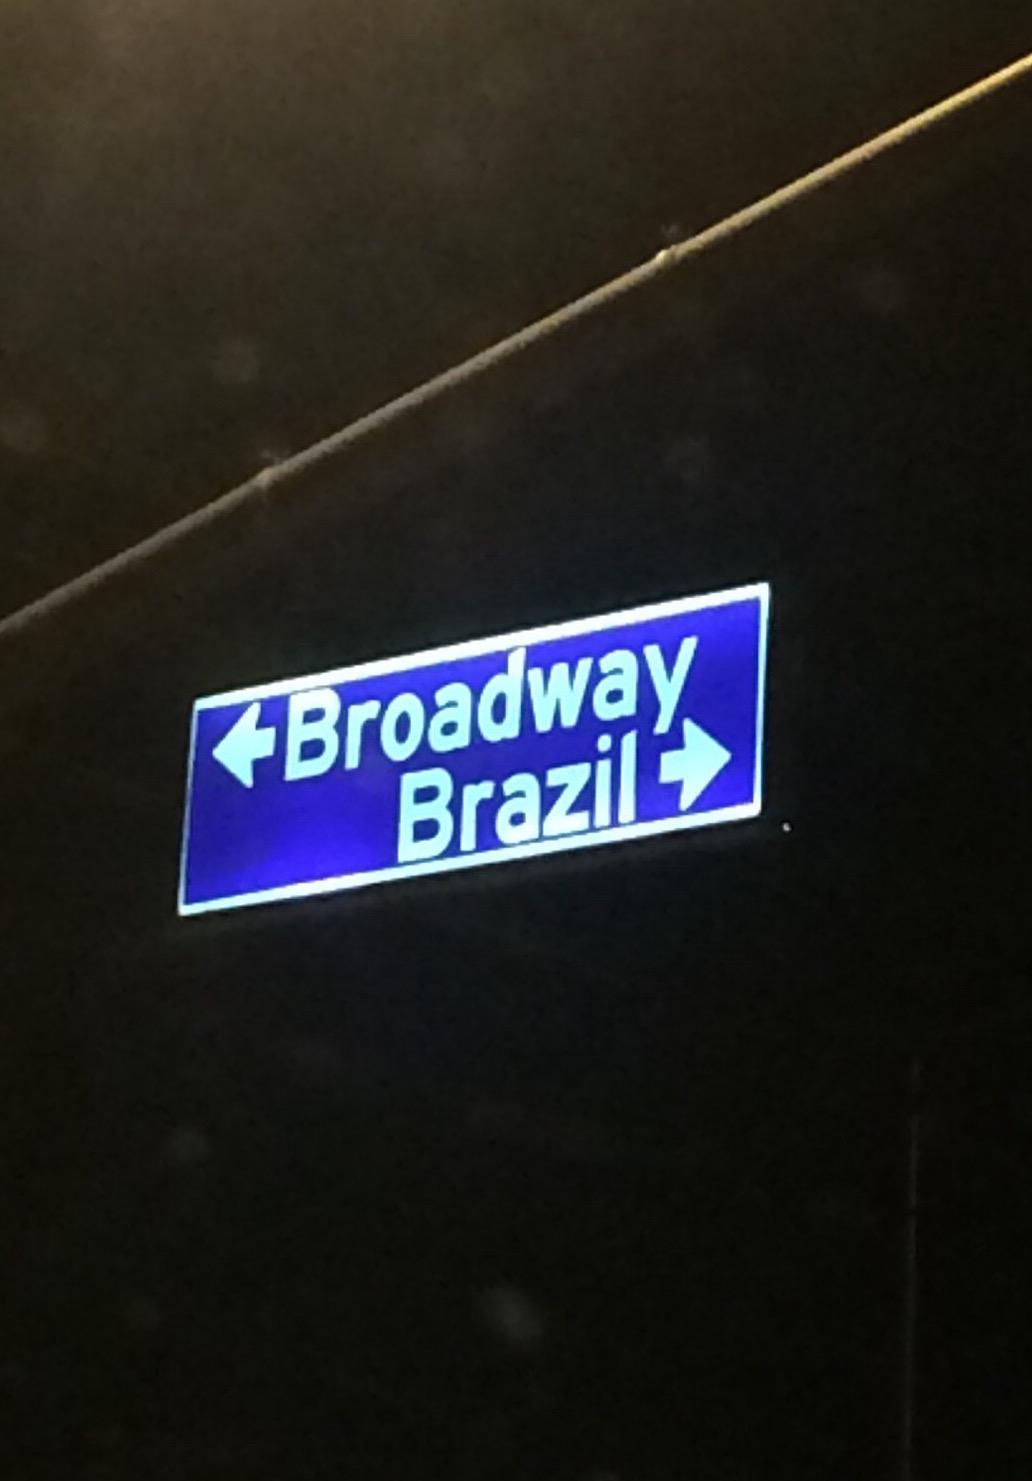 Broadway / Brazil, 2016